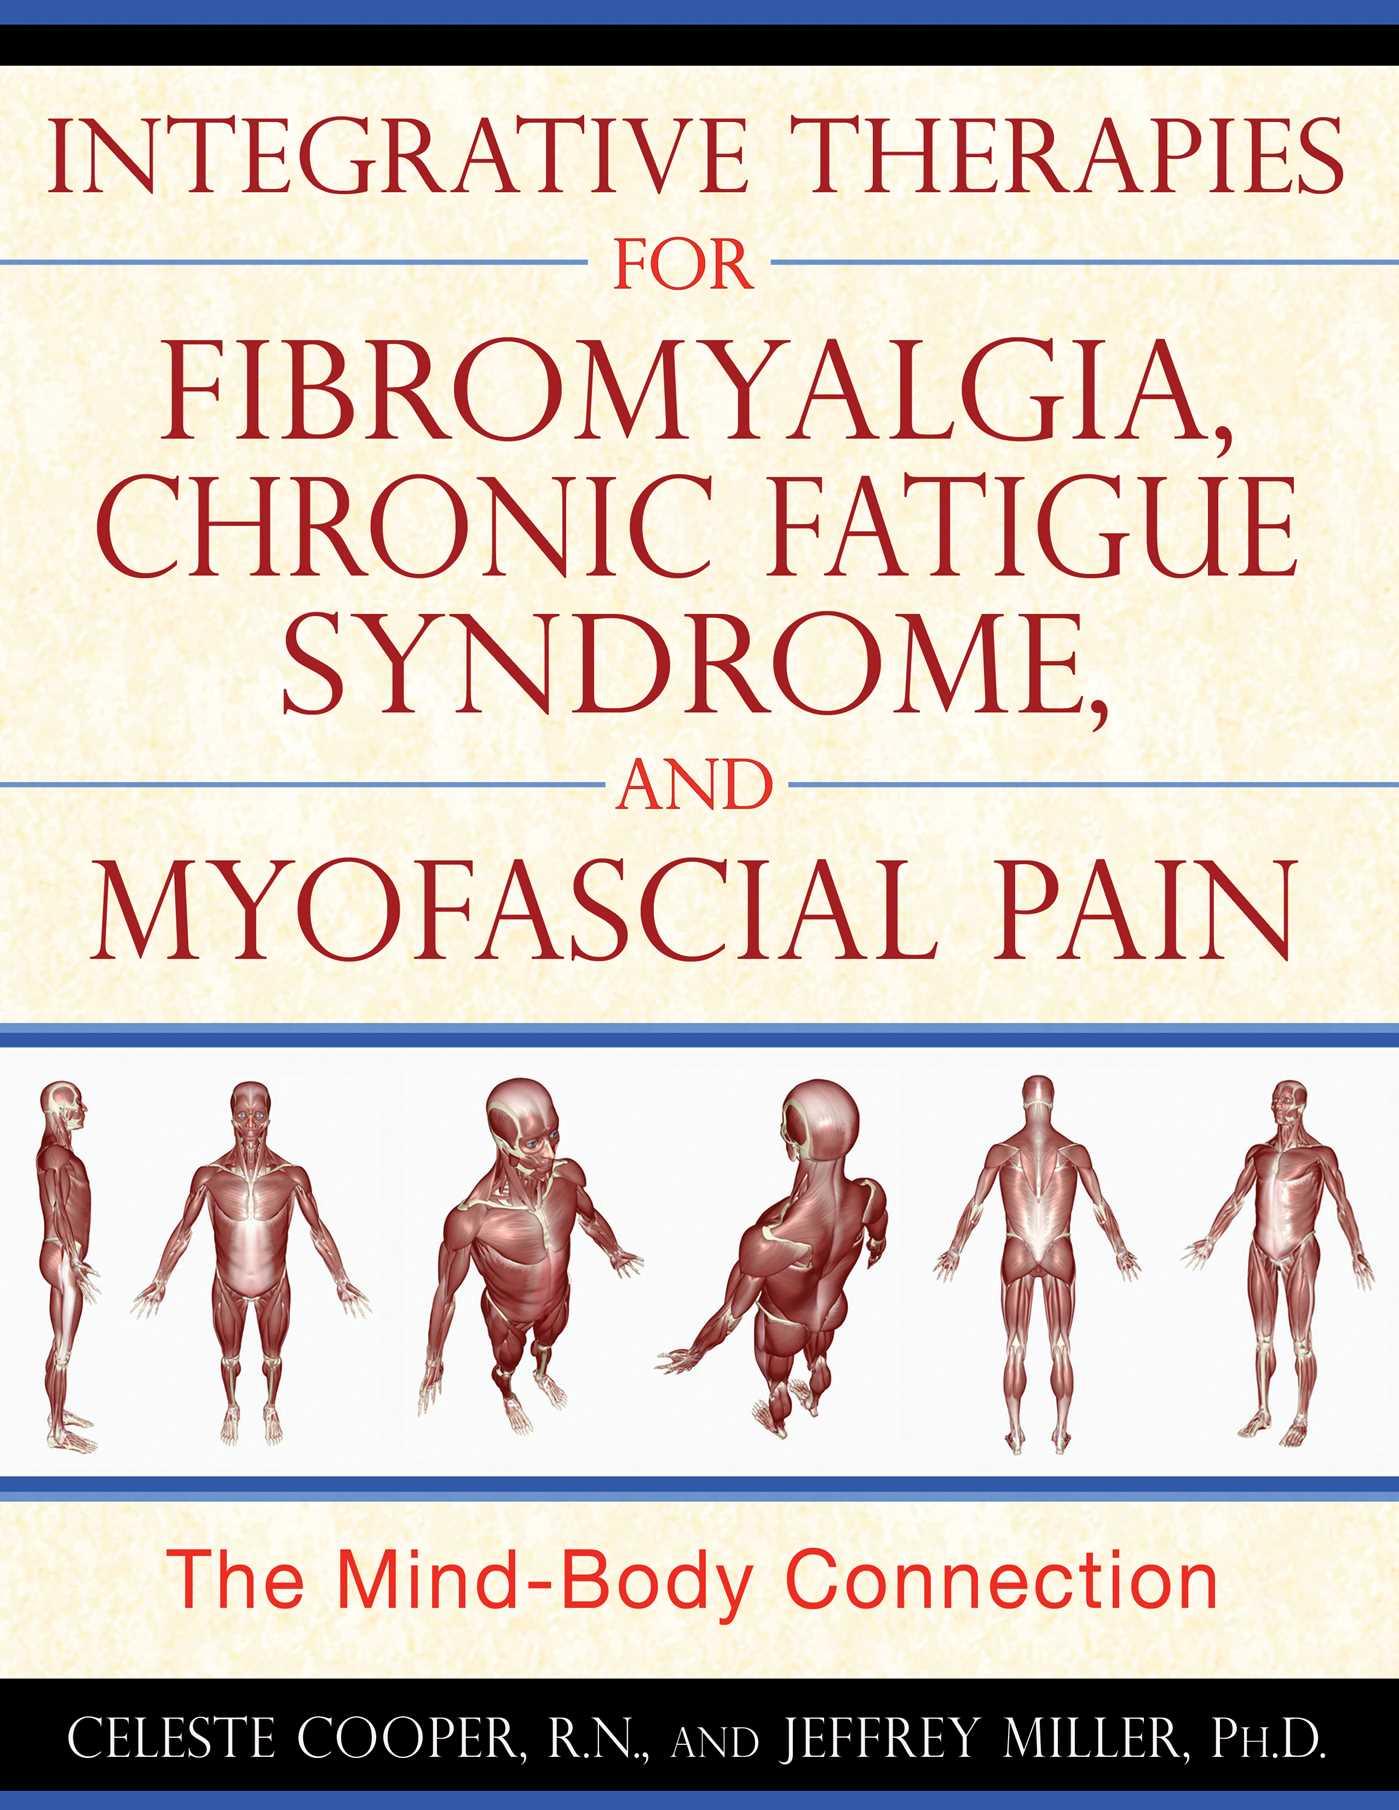 Integrative Therapies for Fibromyalgia, Chronic Fatigue